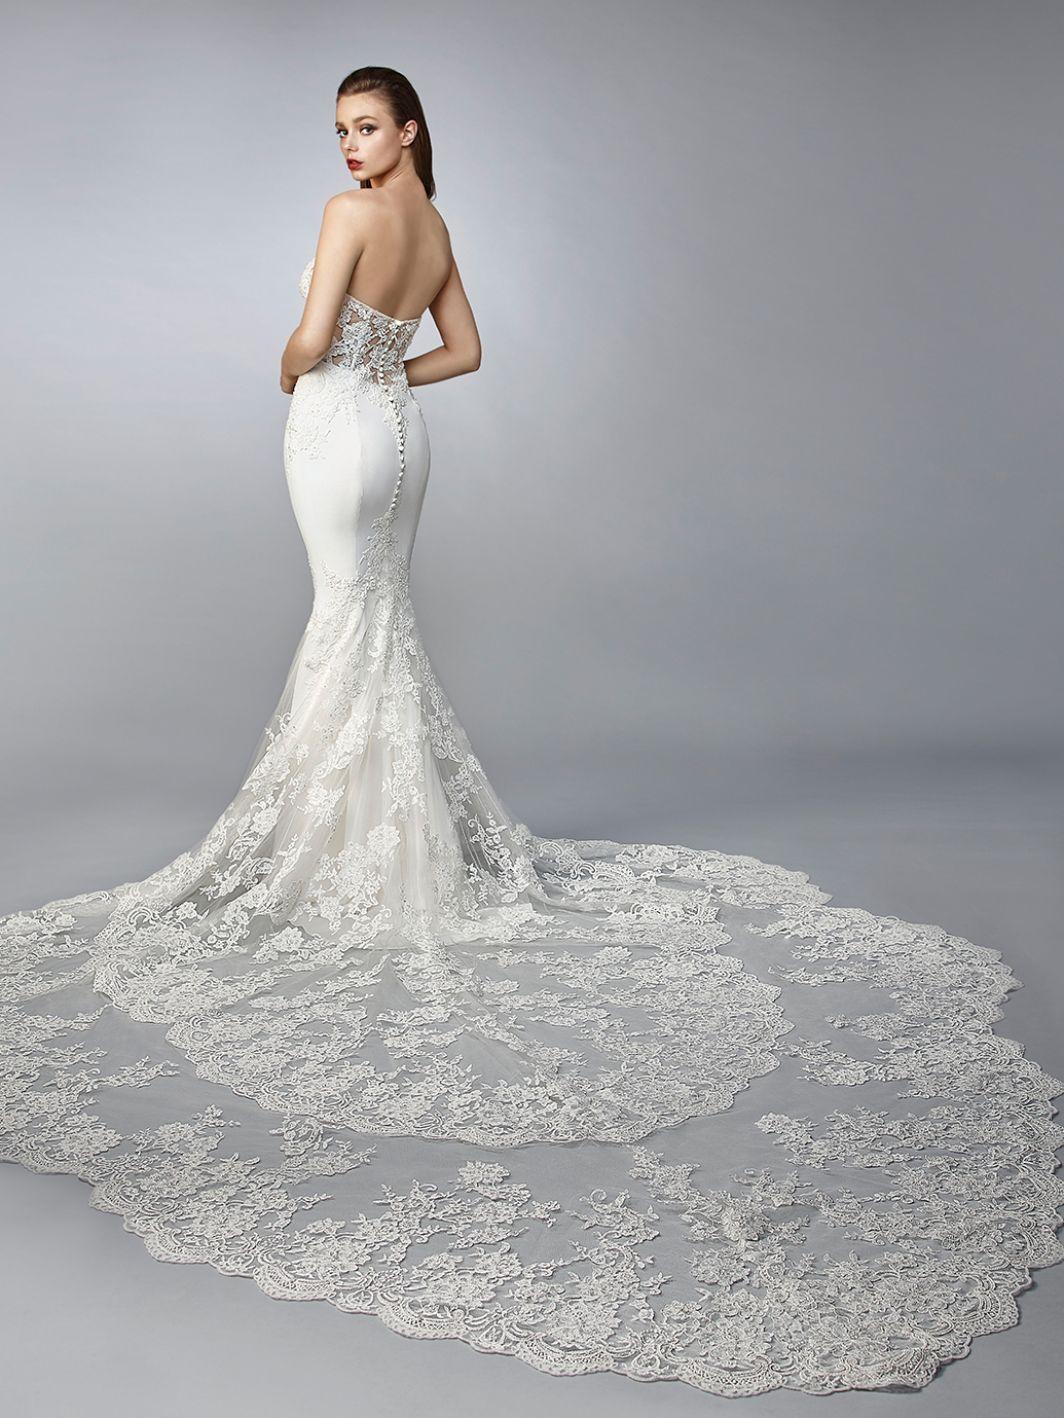 eb6023f7f65f3 NAMI   Enzoani 2019   2019 Enzoani Collection in 2019   Wedding ...